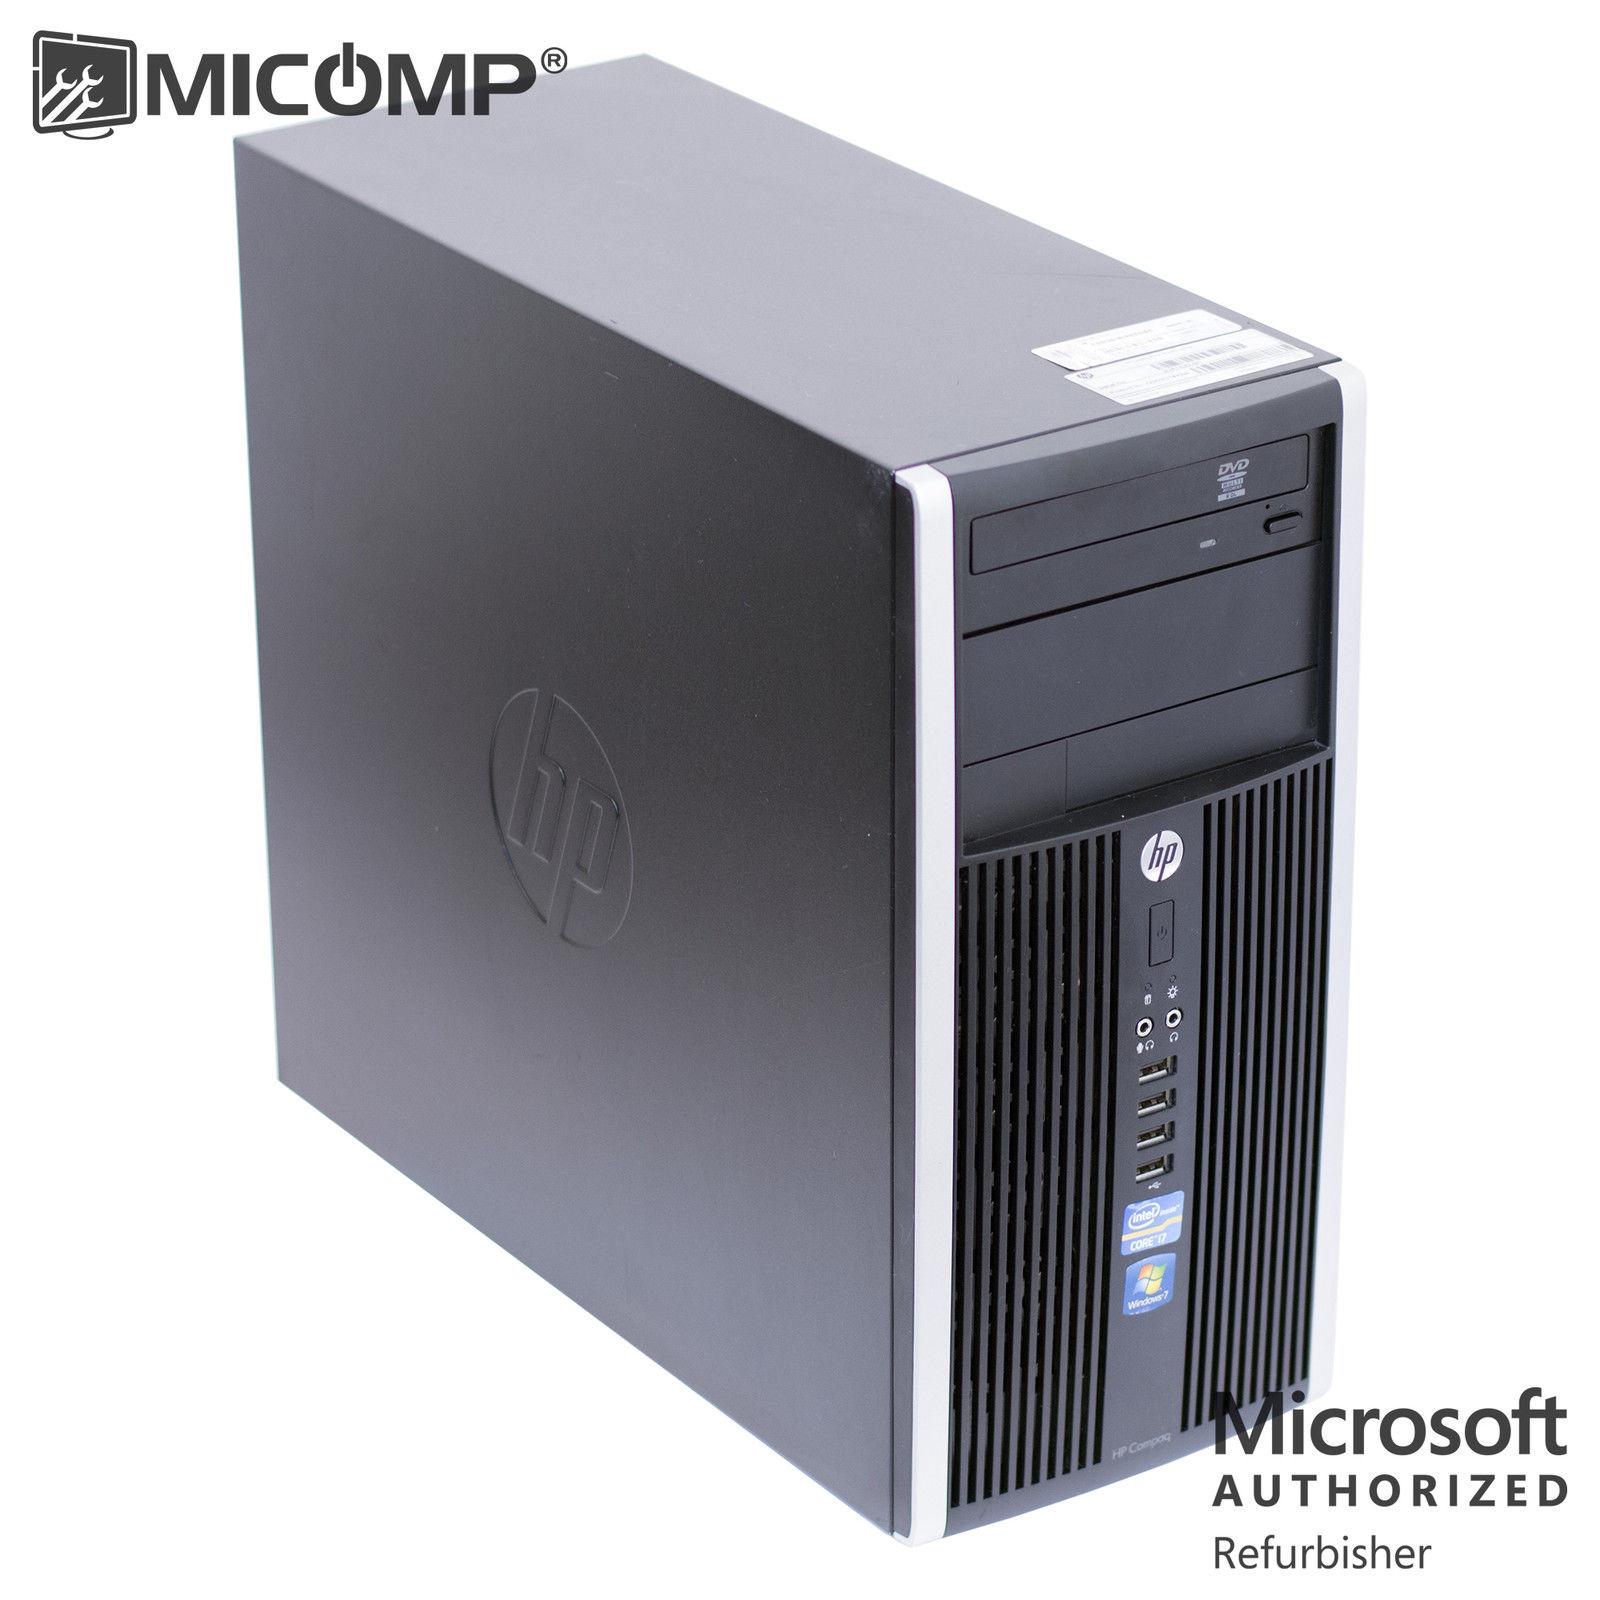 HP Gaming Computer Nvidia GTX 1050 Video Core i5 3.2Ghz 16Gb 1TB HDD Windows 10 HDMI WiFi 1 Year Warranty 3